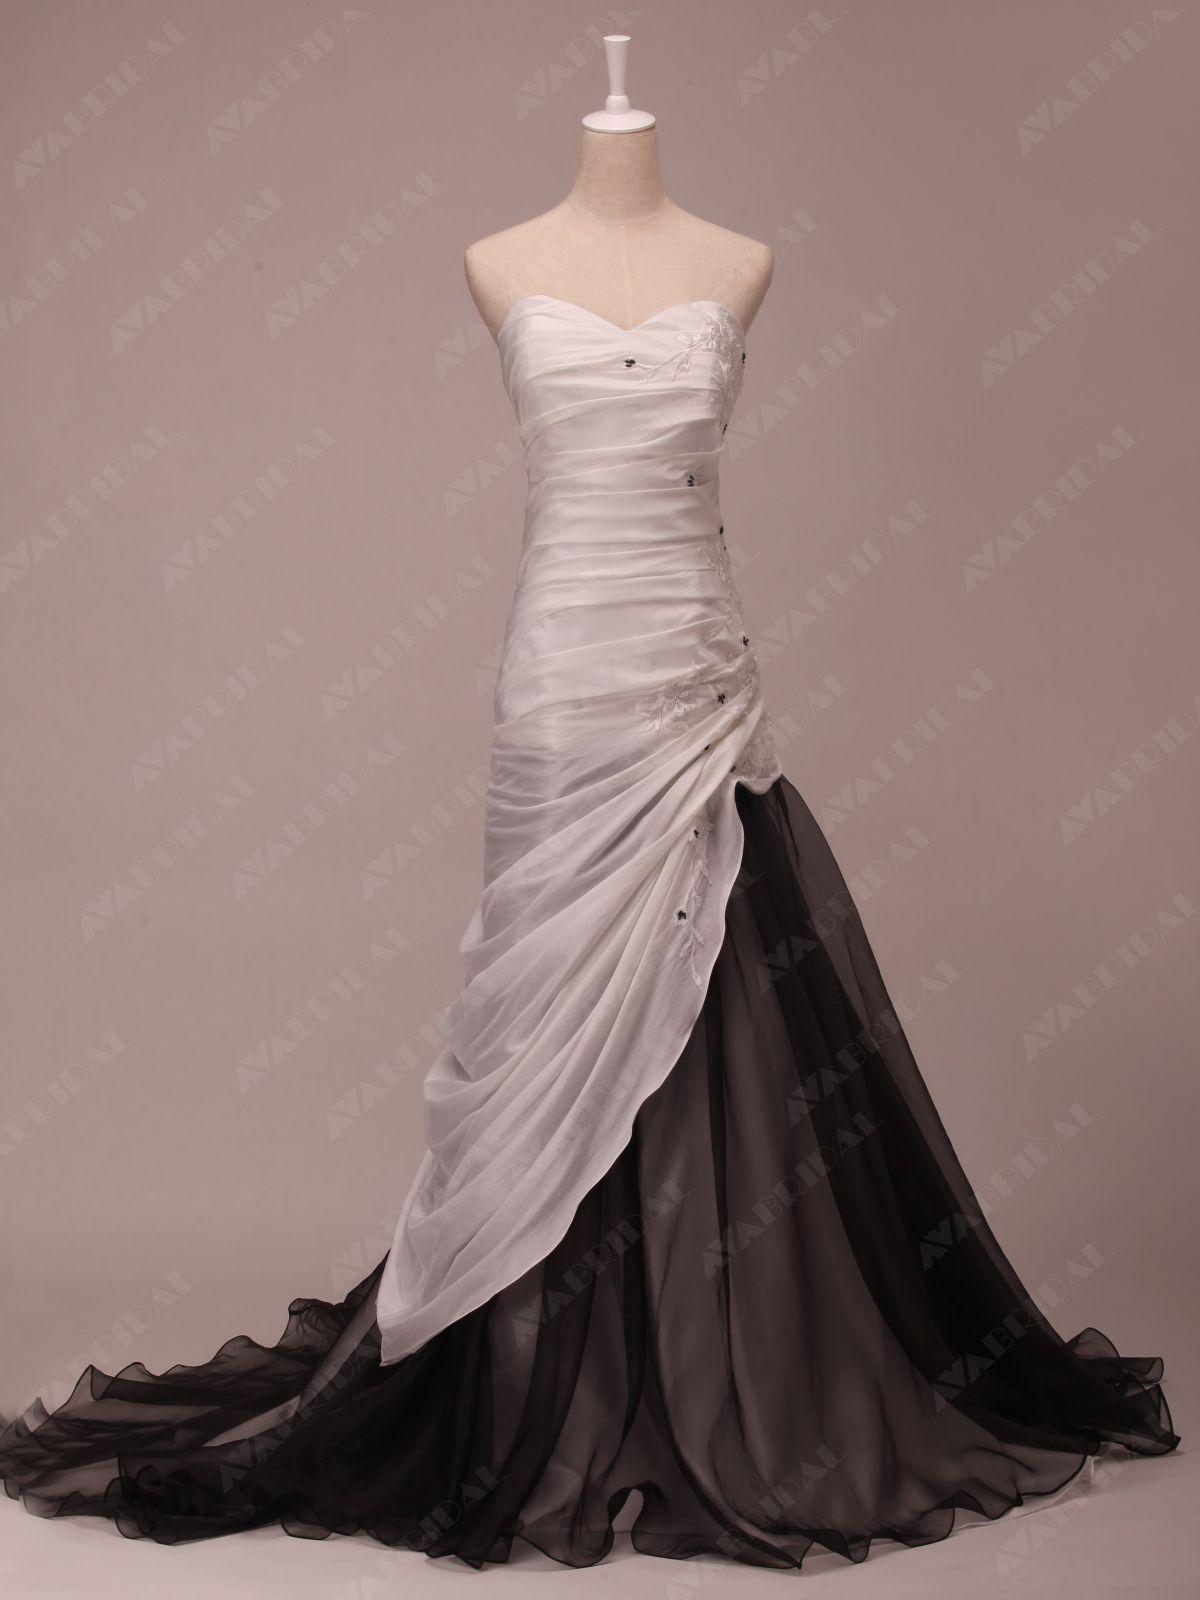 Colored wedding dress ava bridalalthough i would rather the black